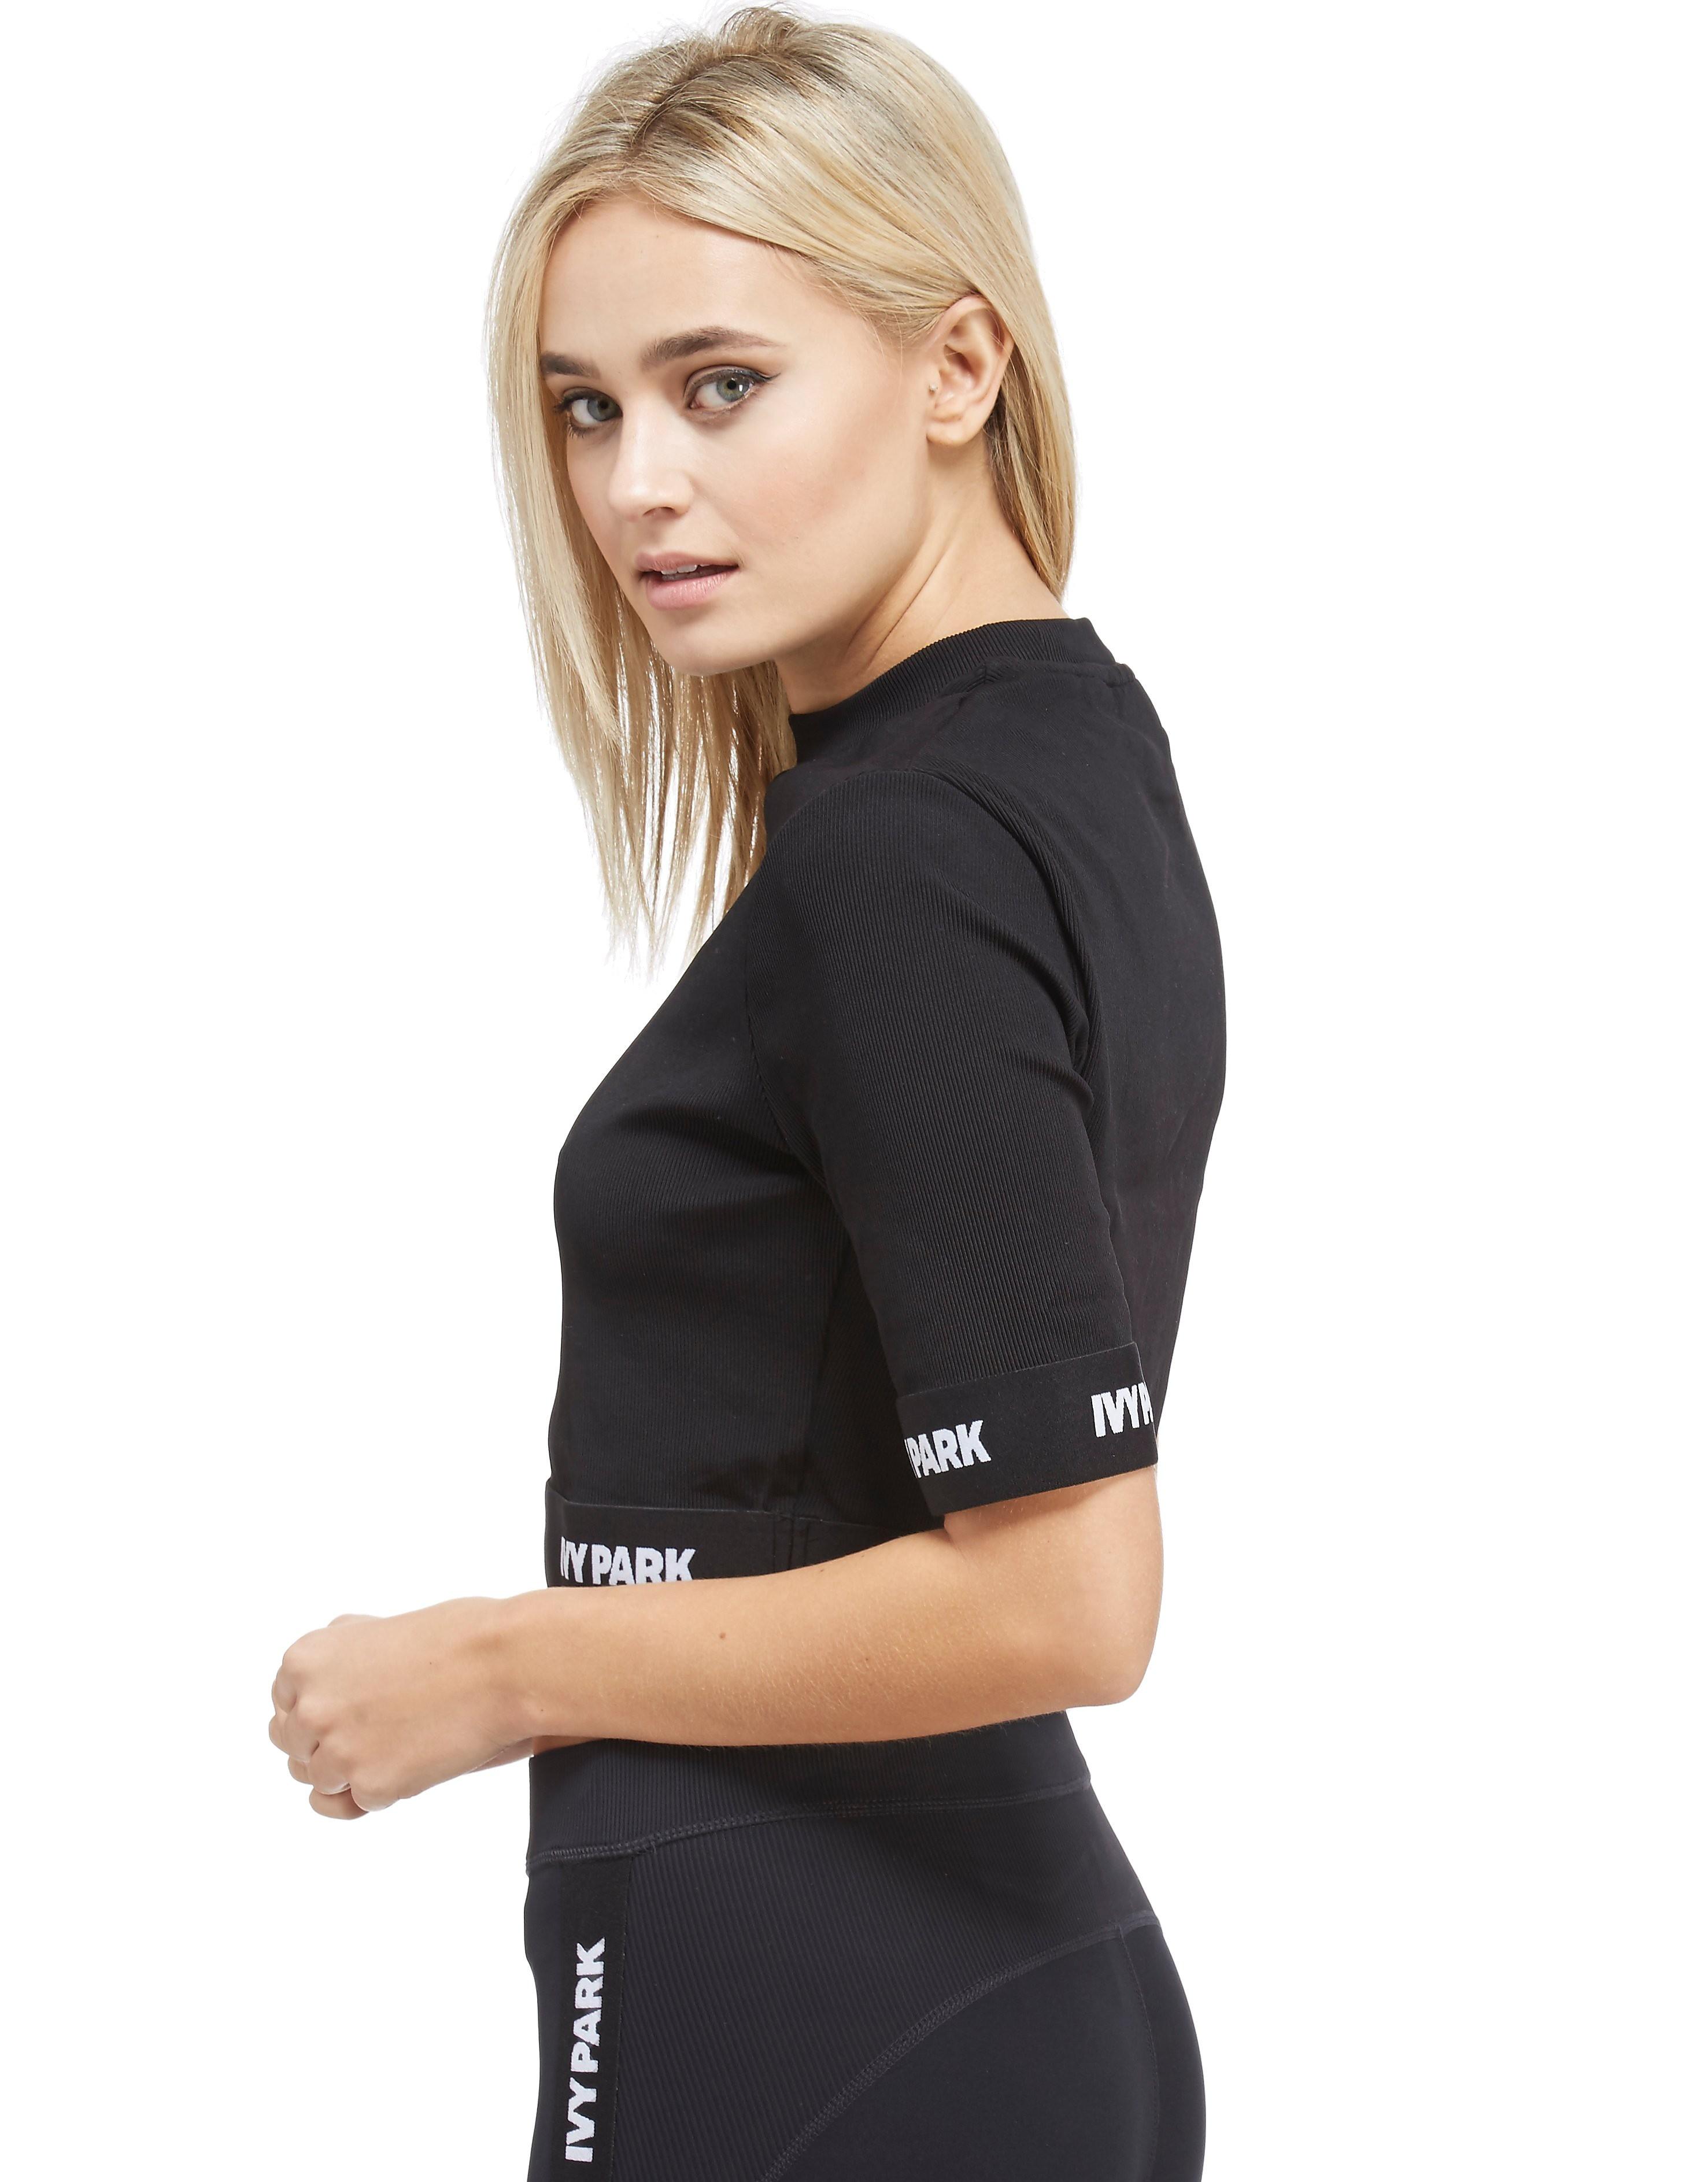 IVY PARK Tape T-Shirt